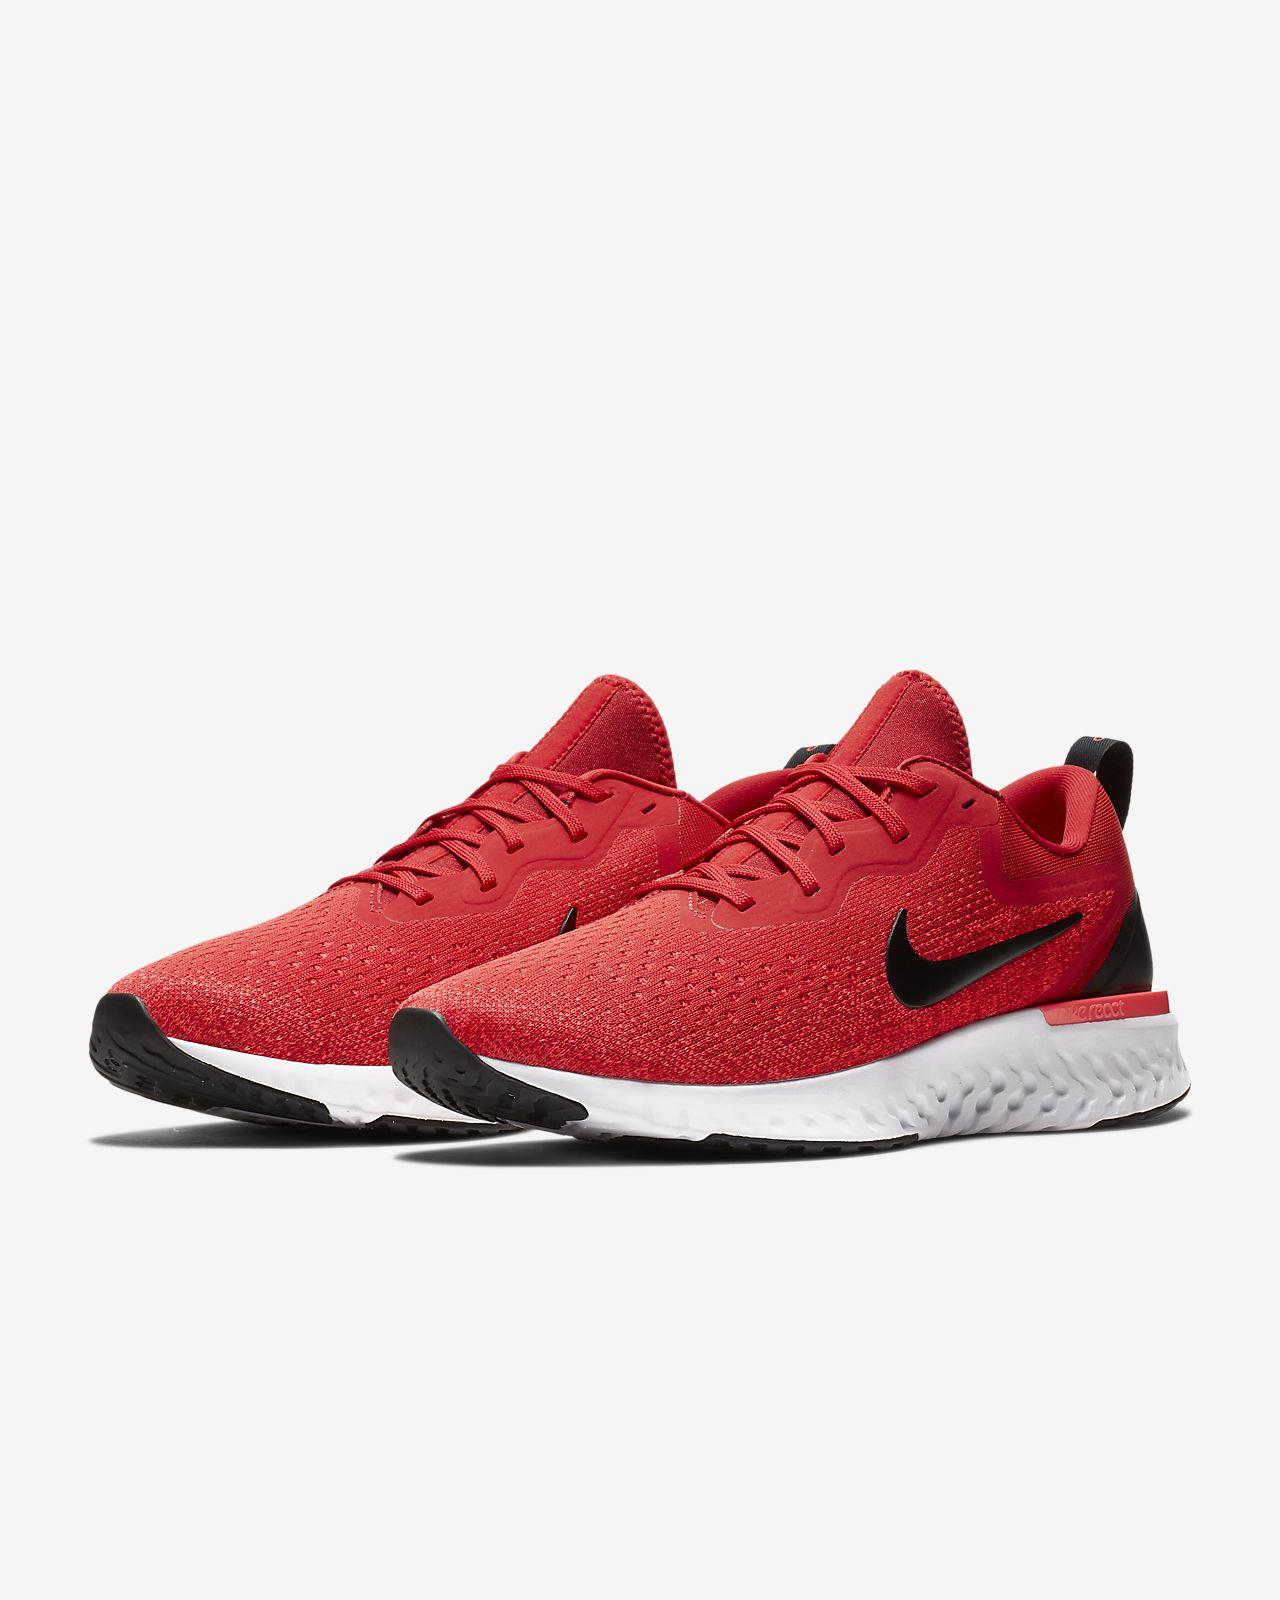 Odyssey Calzado Hombre Running ReactMx Para Nike De T3lFK1Jc